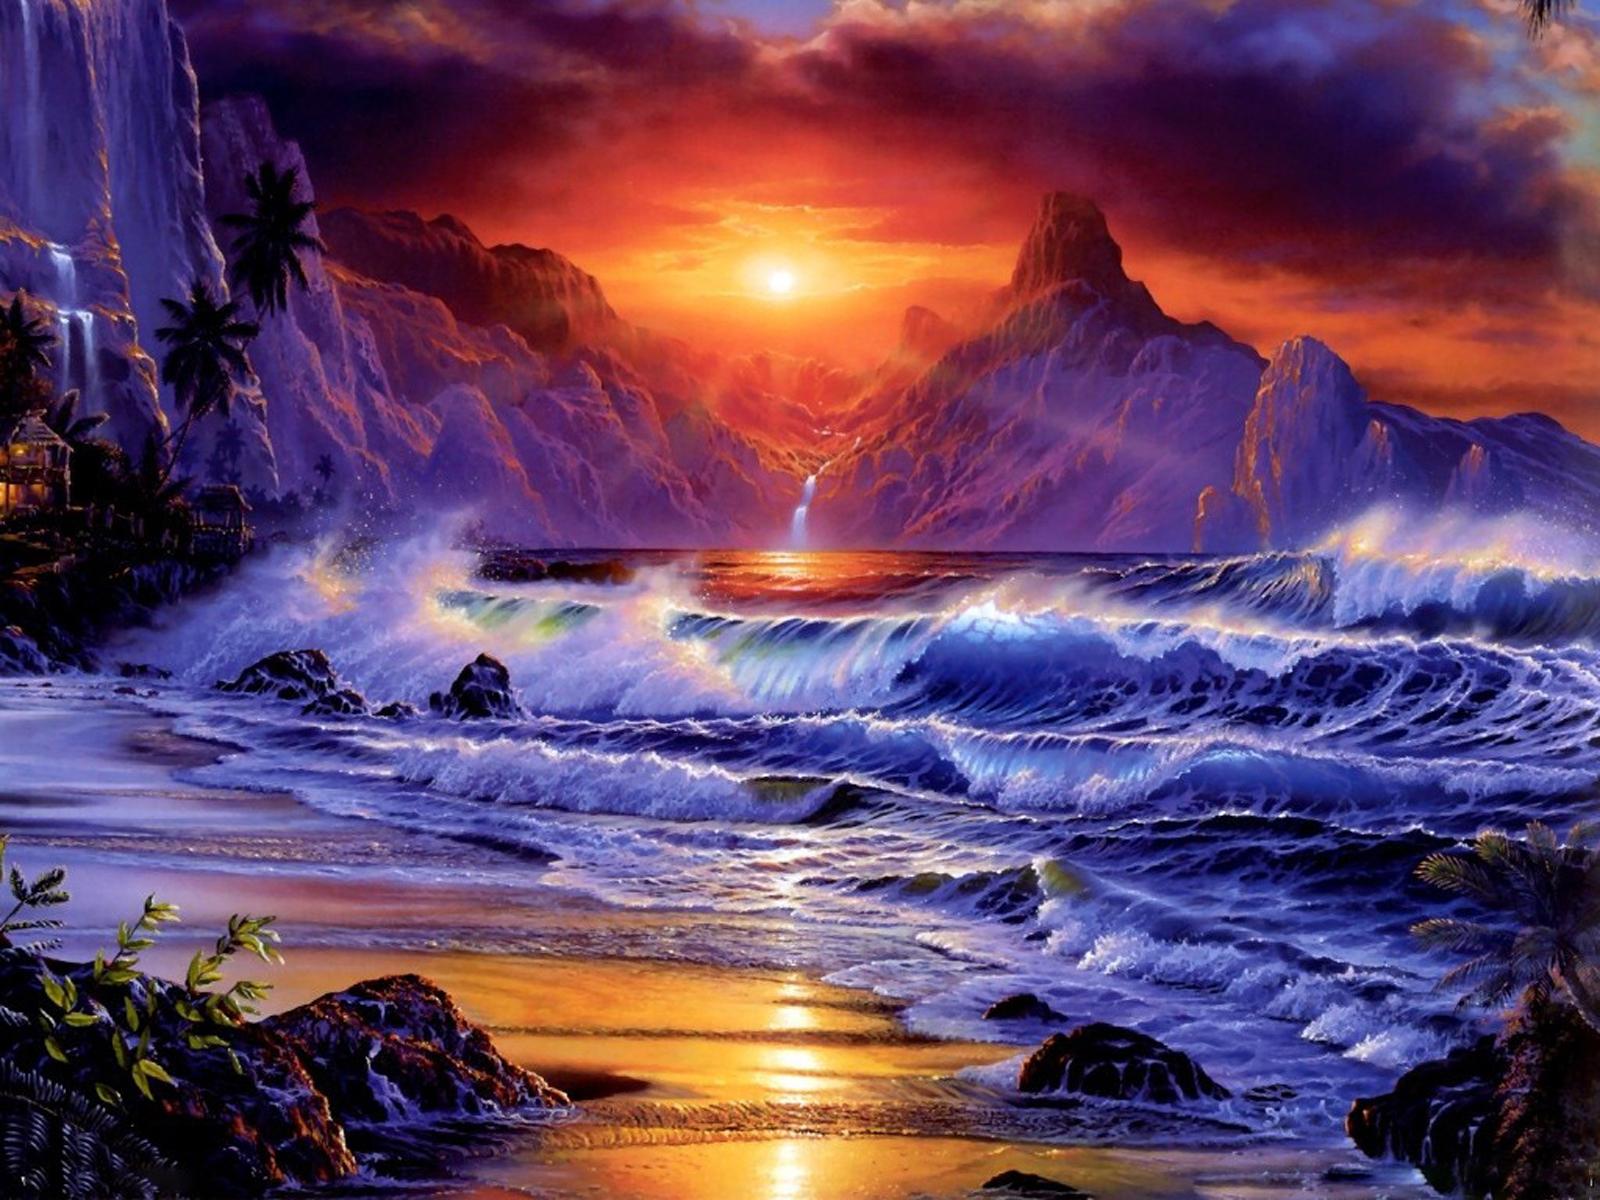 desktop wallpaper of amazing fantasy sunset computer desktop 1600x1200